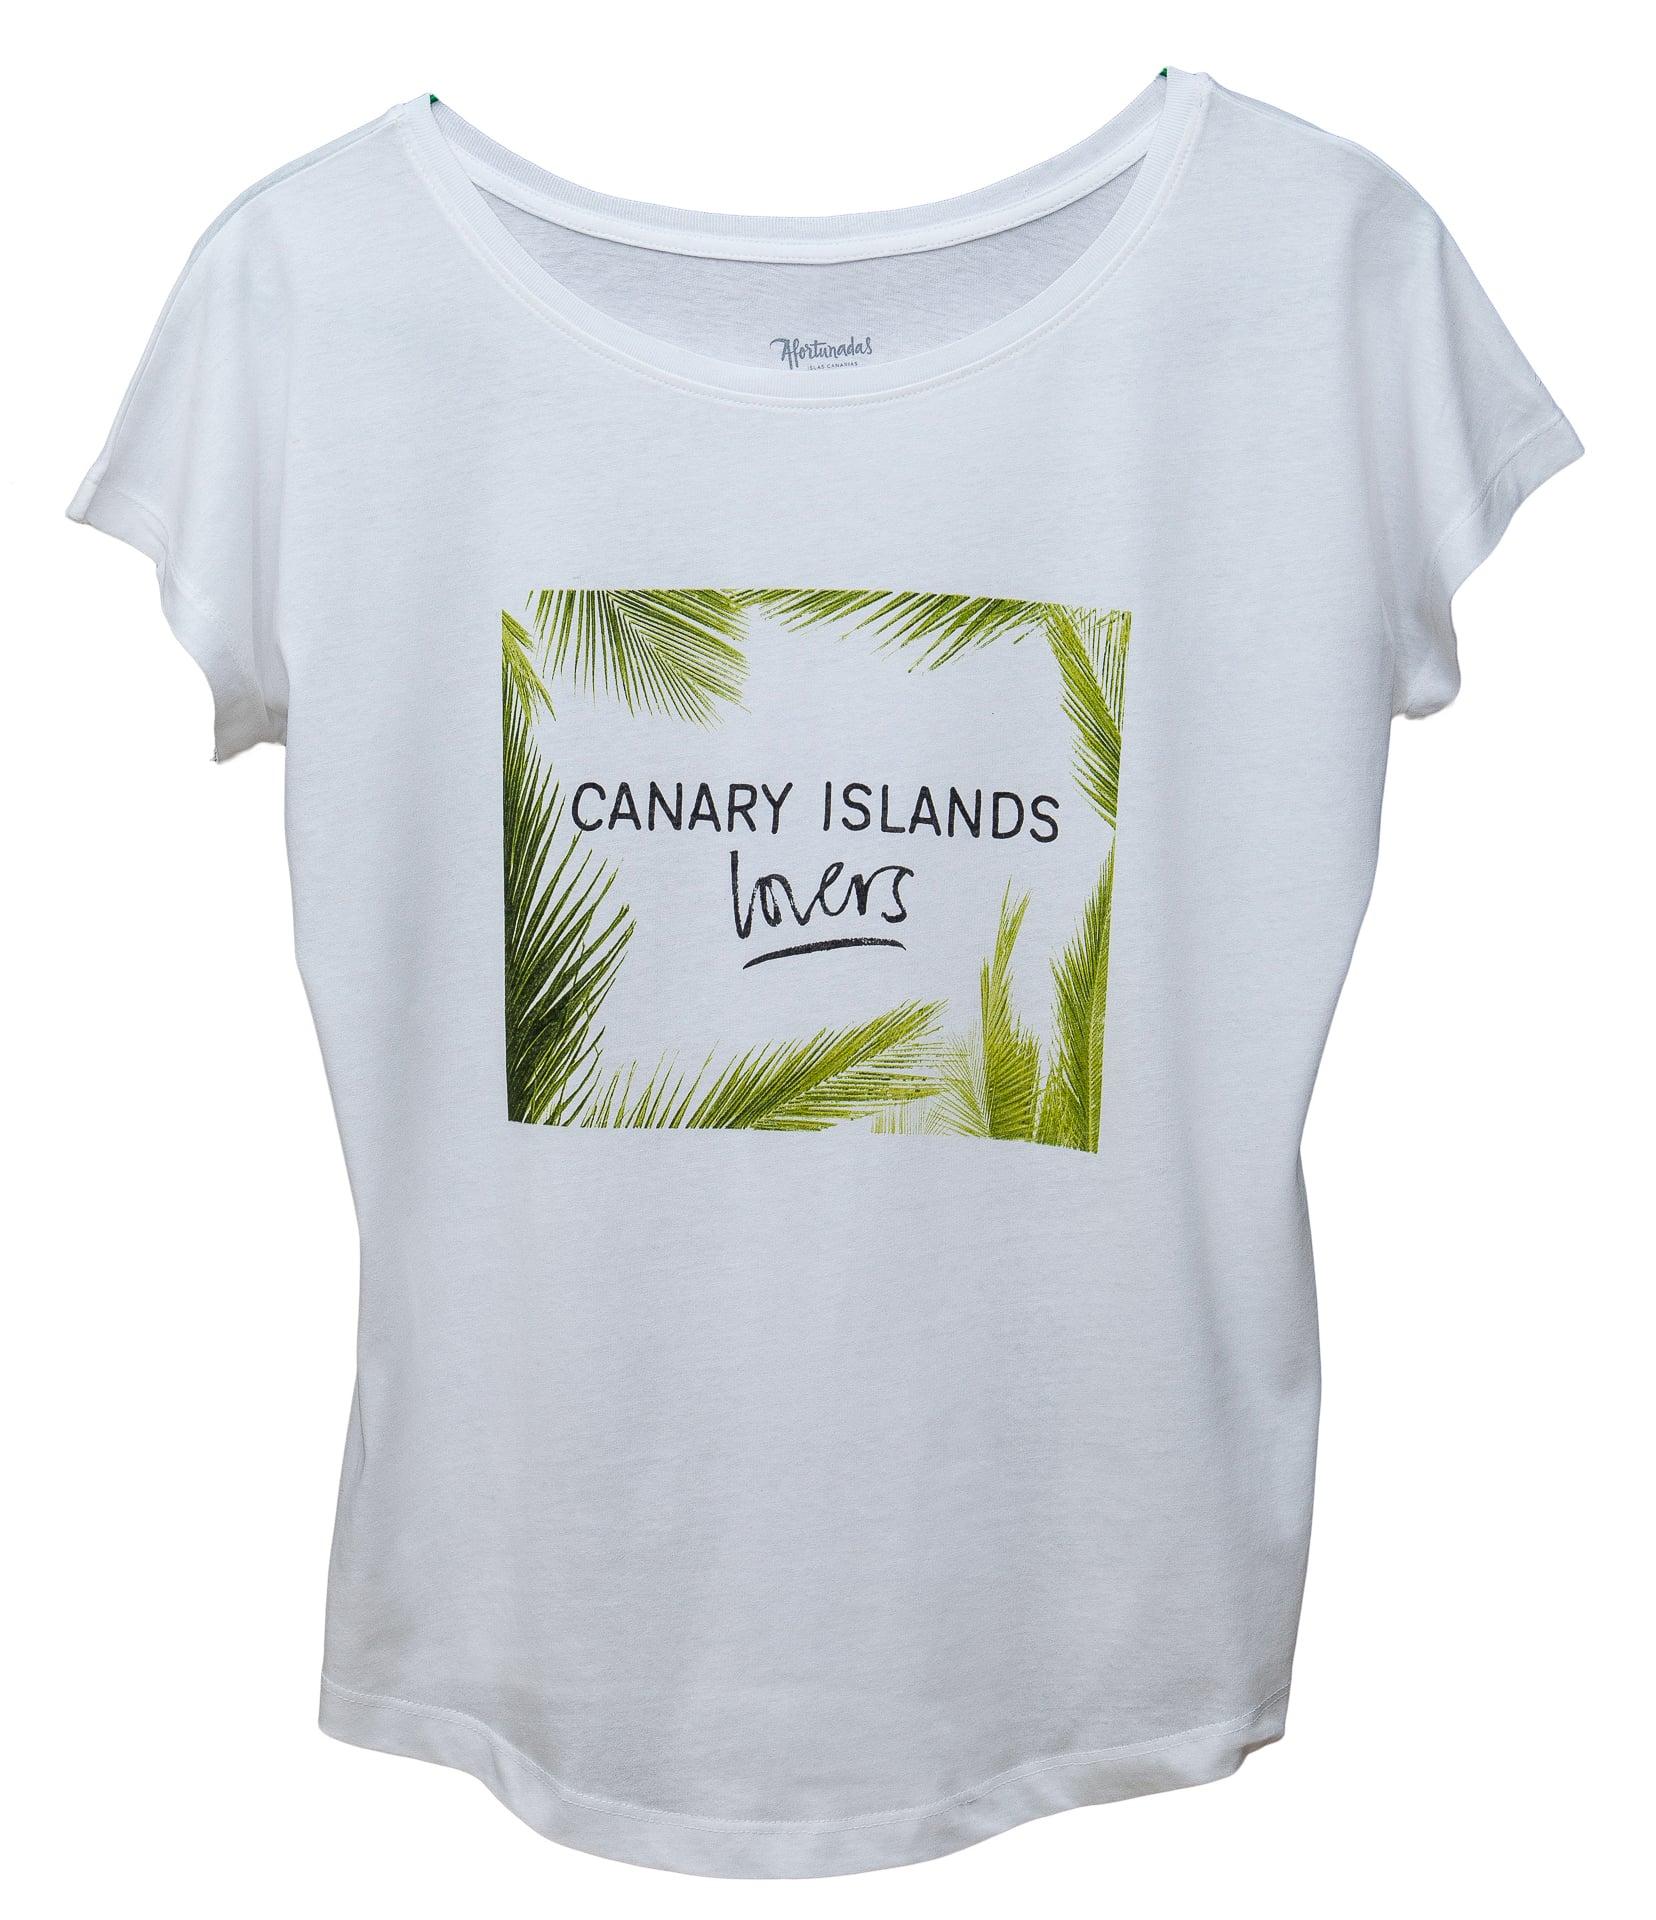 Canary Islands lover -  Woman Tshirt